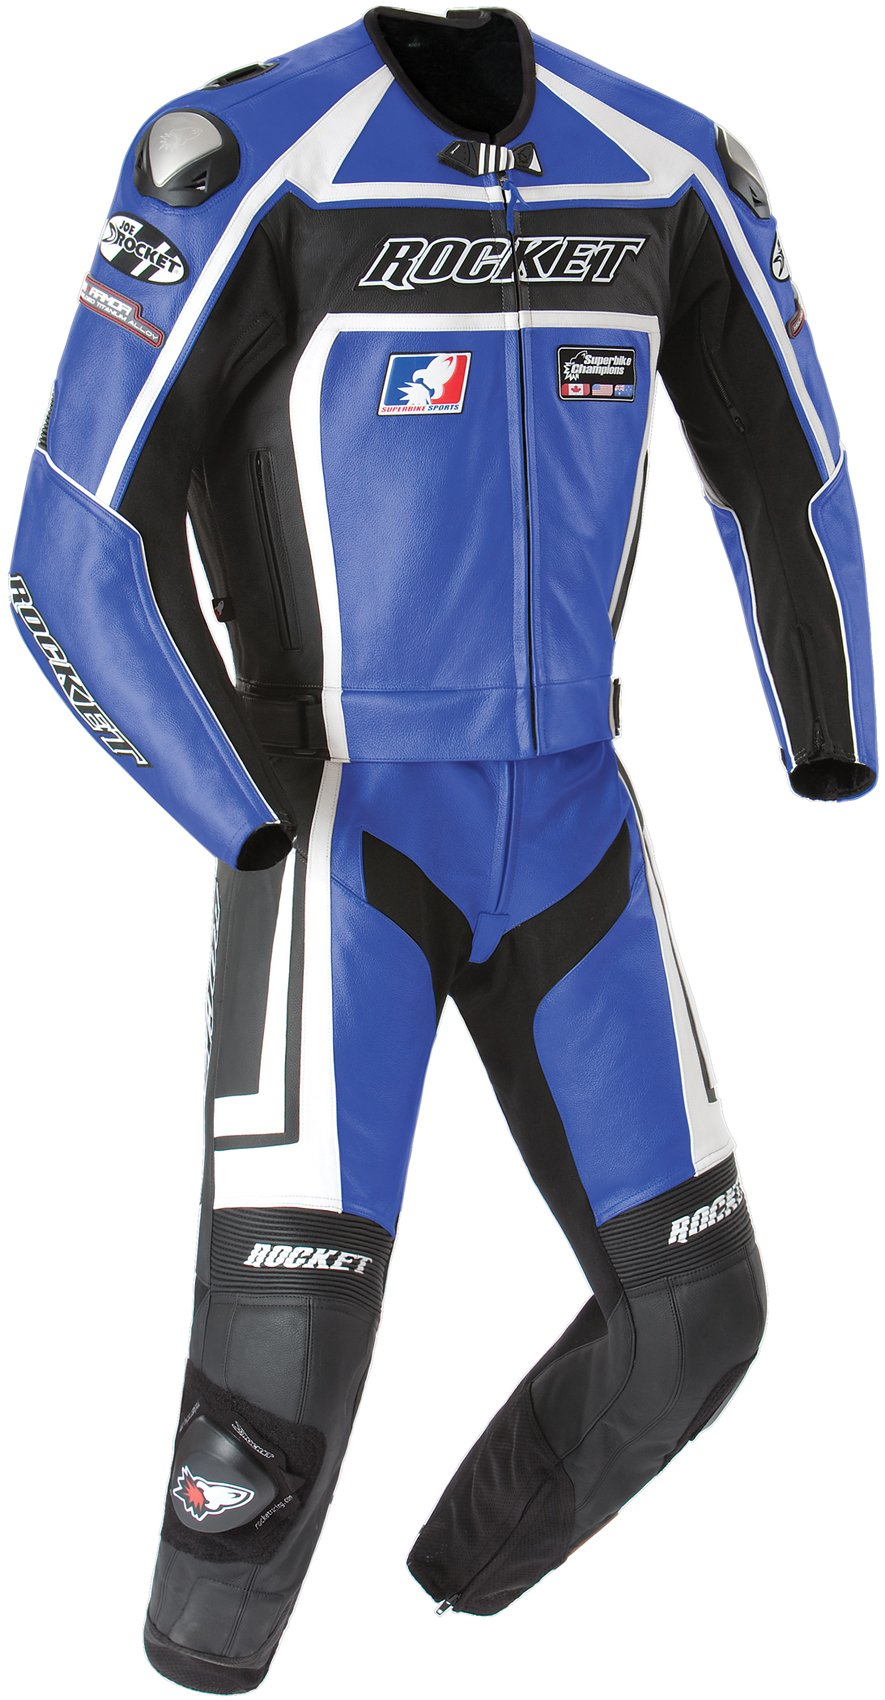 Joe Rocket Speedmaster 5.0 Men's Leather 2-Piece Motorcycle Race Suit (Blue/Black, Size 48)